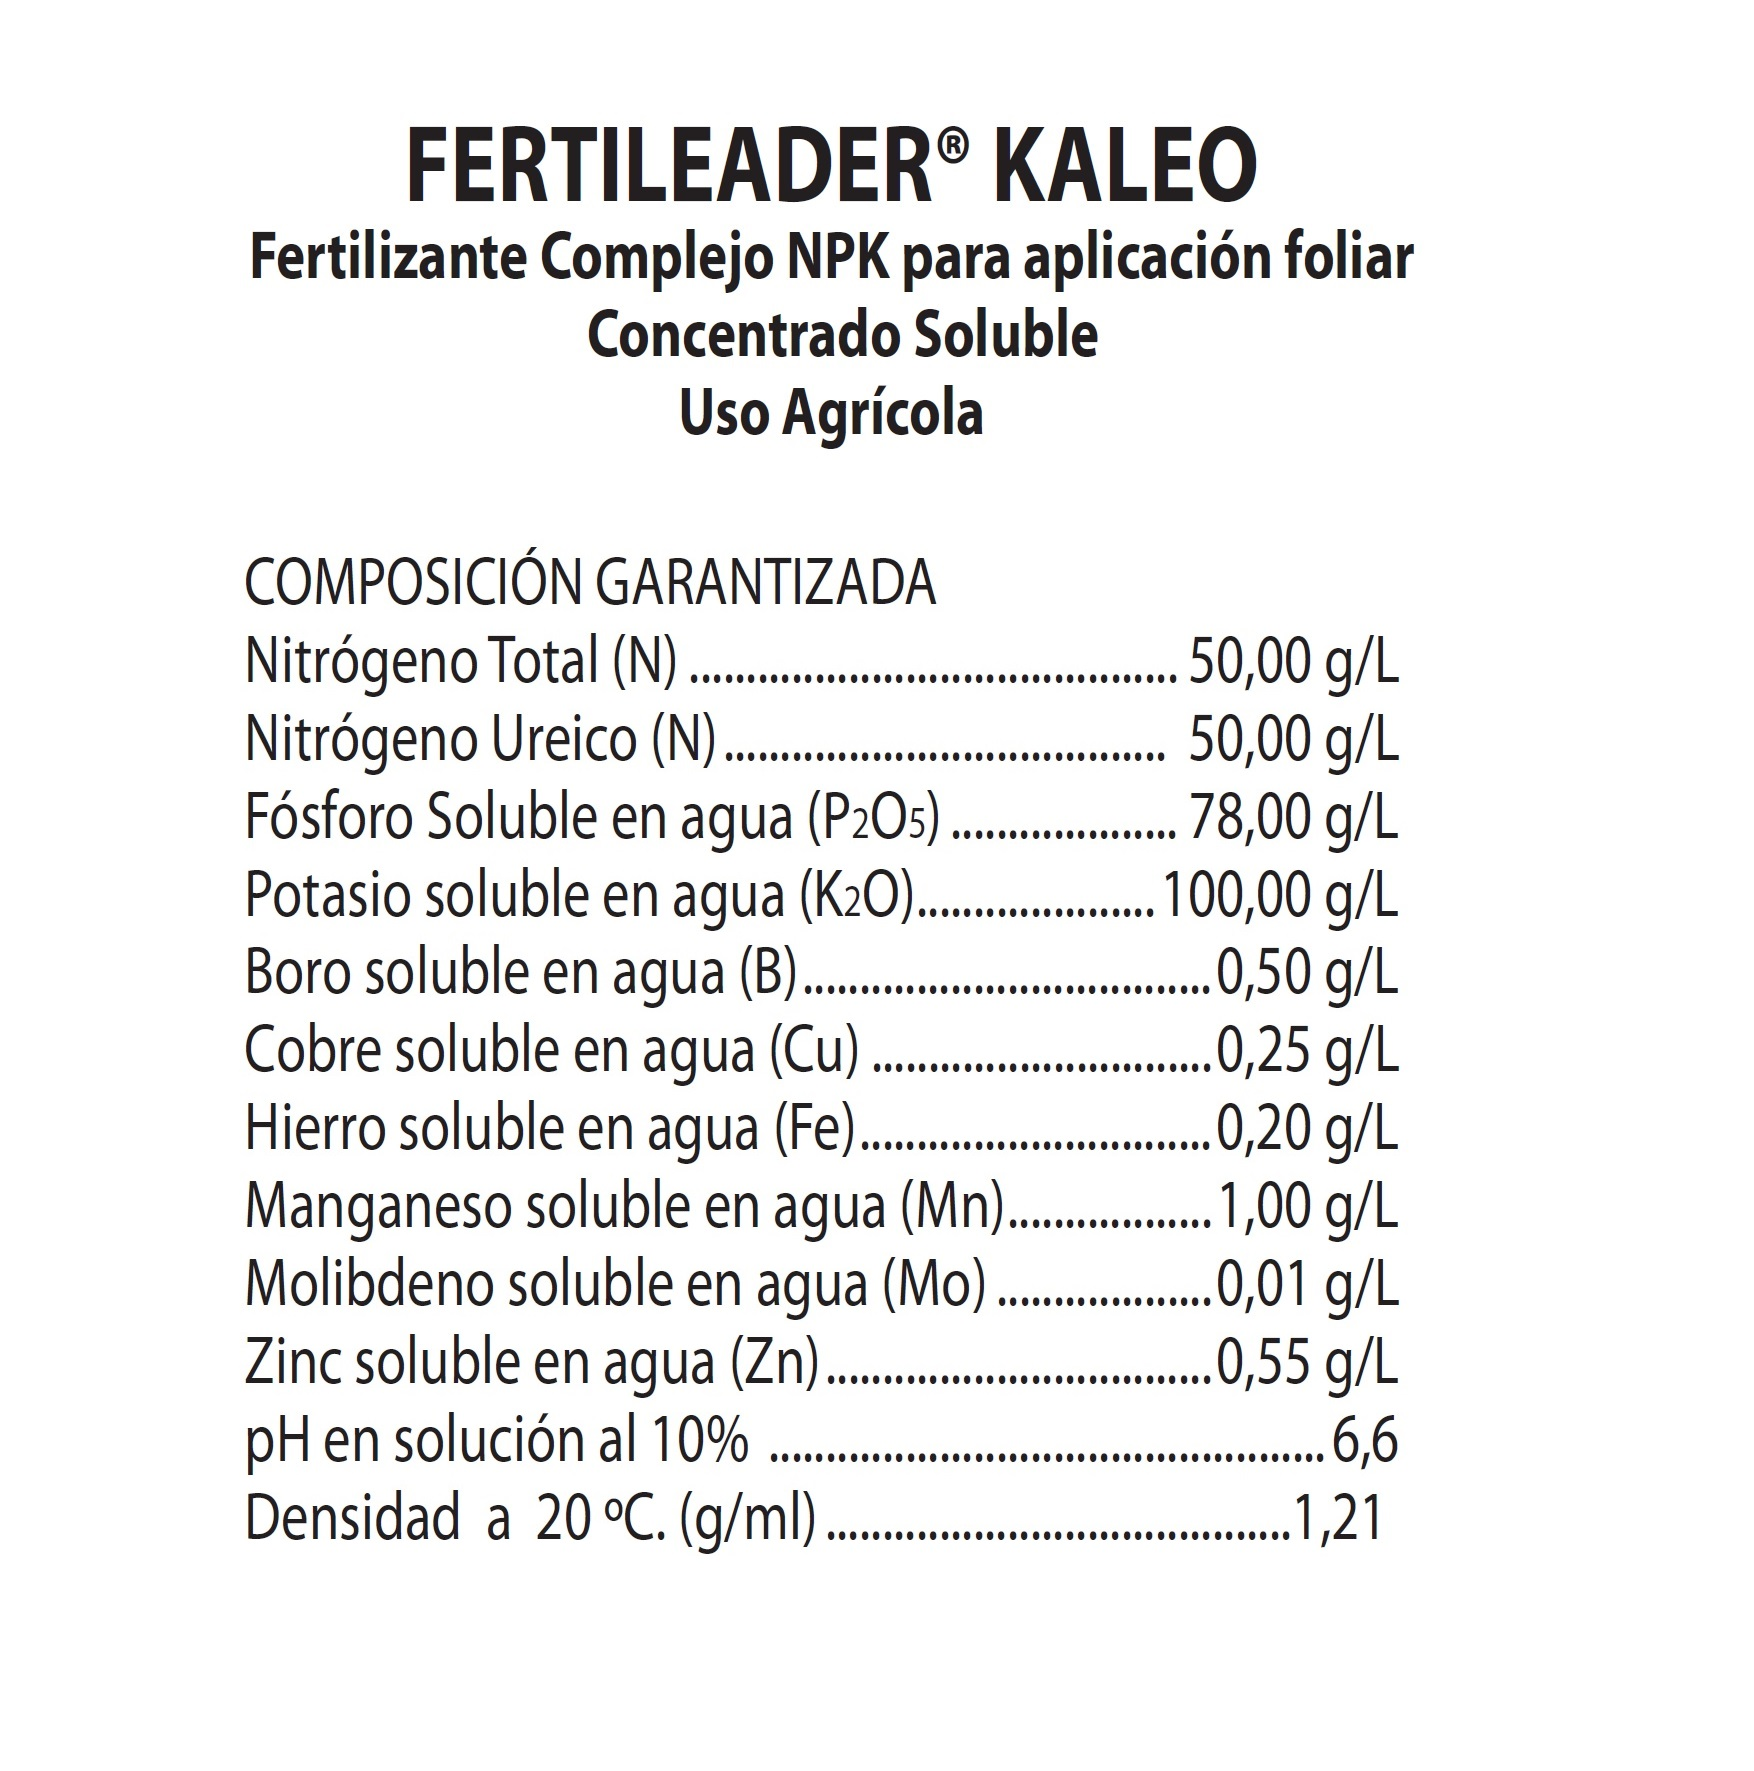 FERTILEADER KALEO X 1 Lt